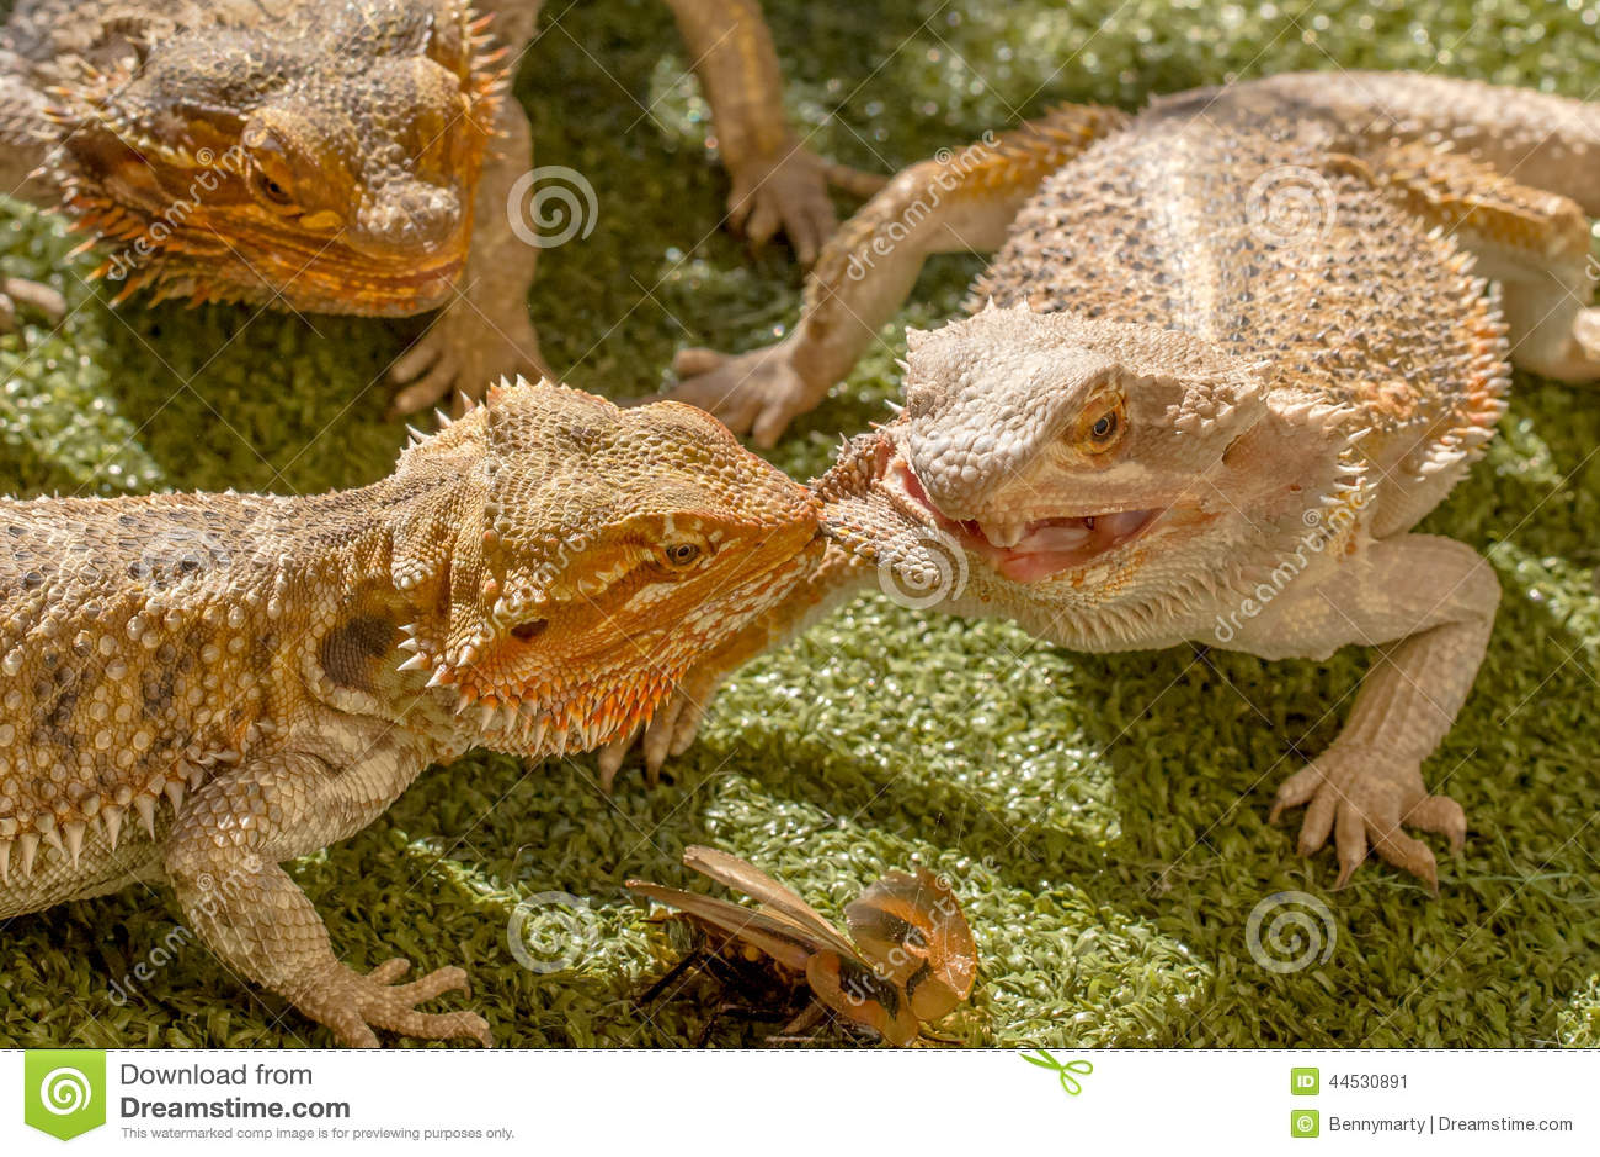 Pogona reptiles